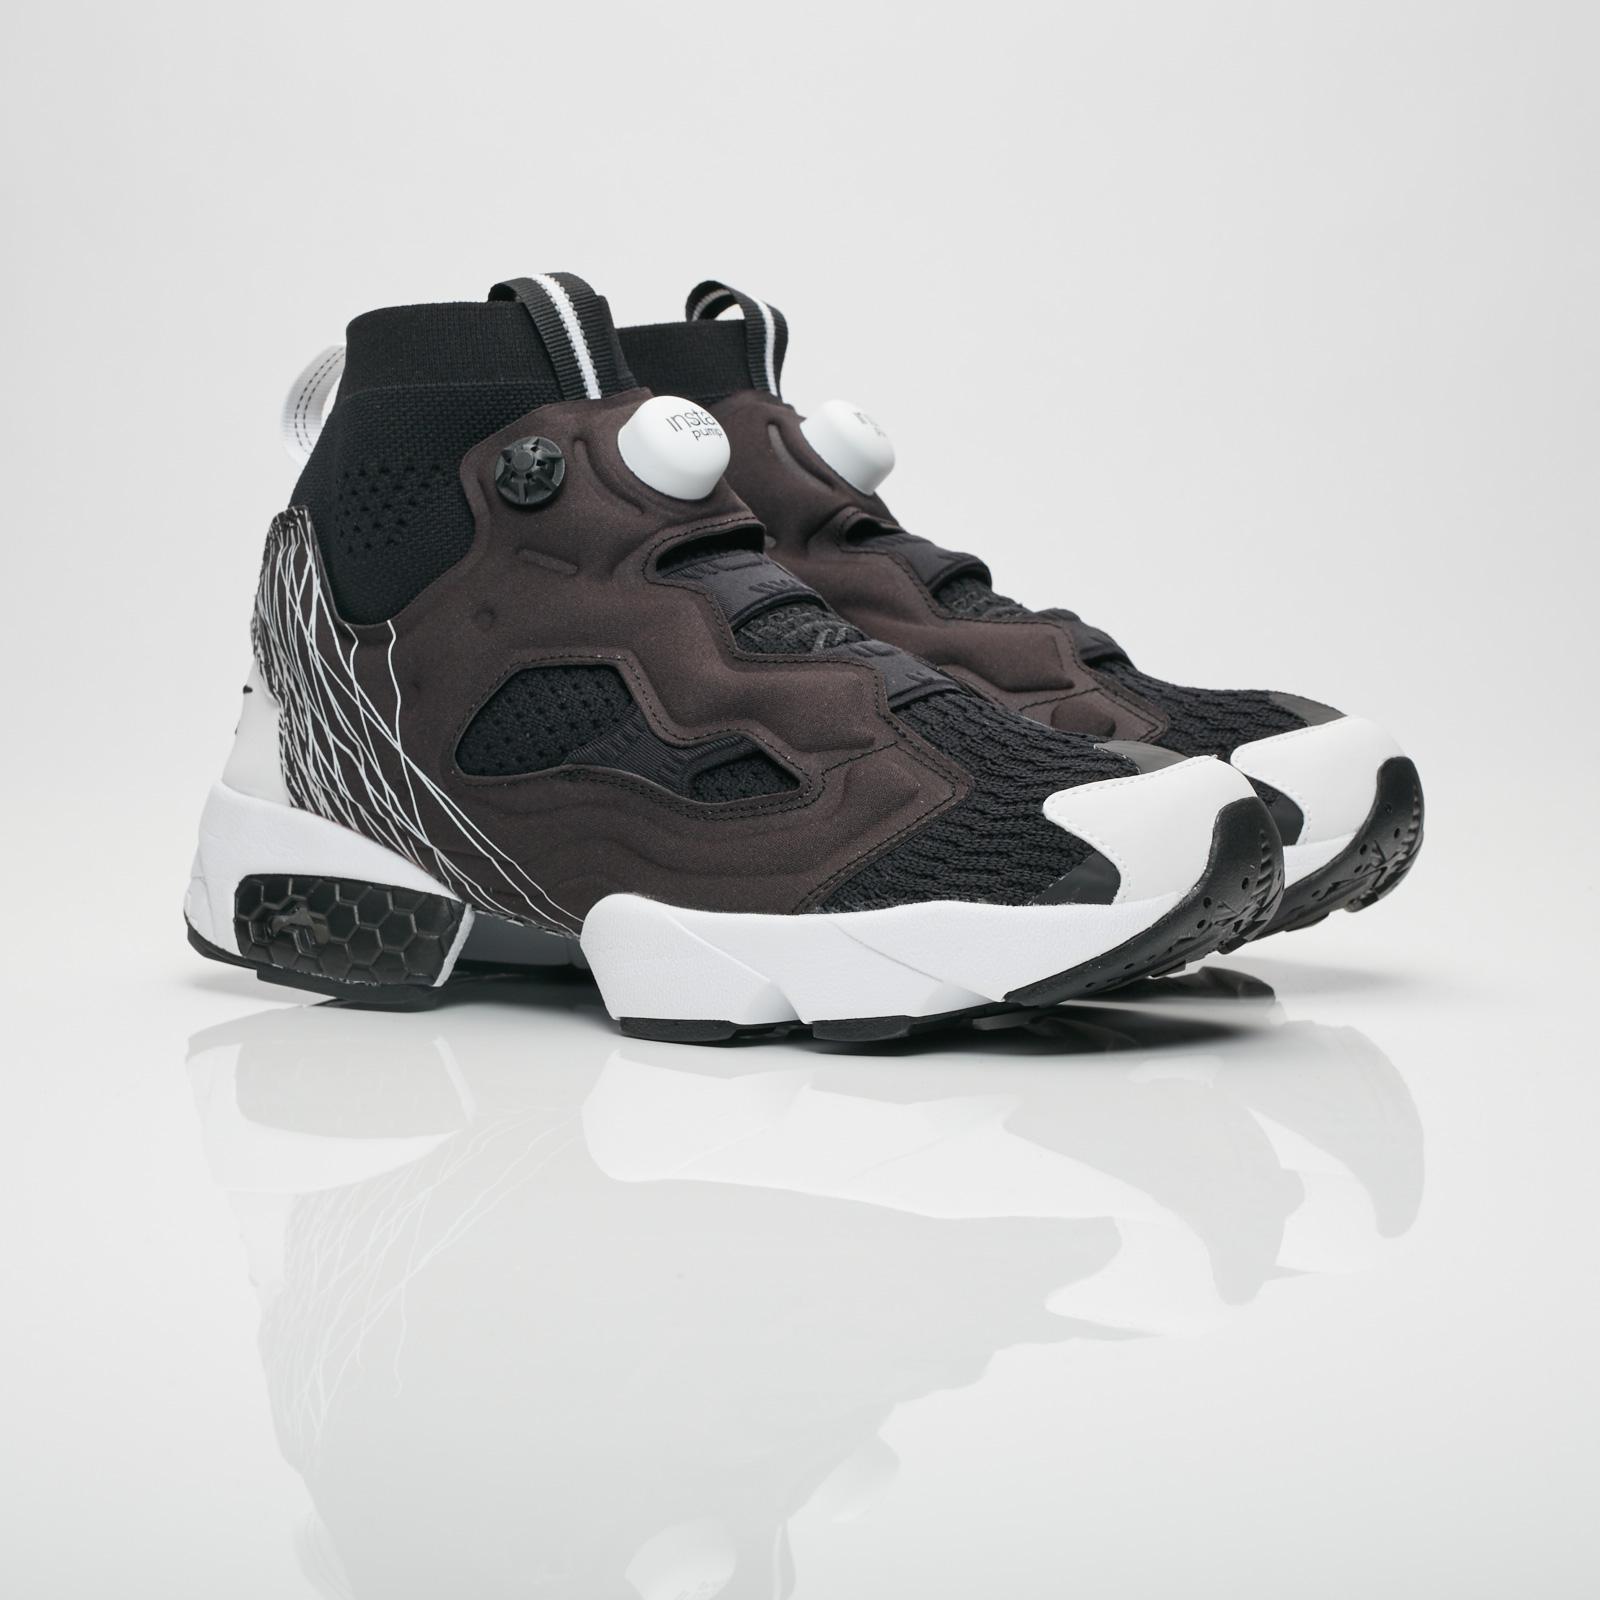 3aa6c513199 Reebok Instapump Fury OG - Bs8159 - Sneakersnstuff